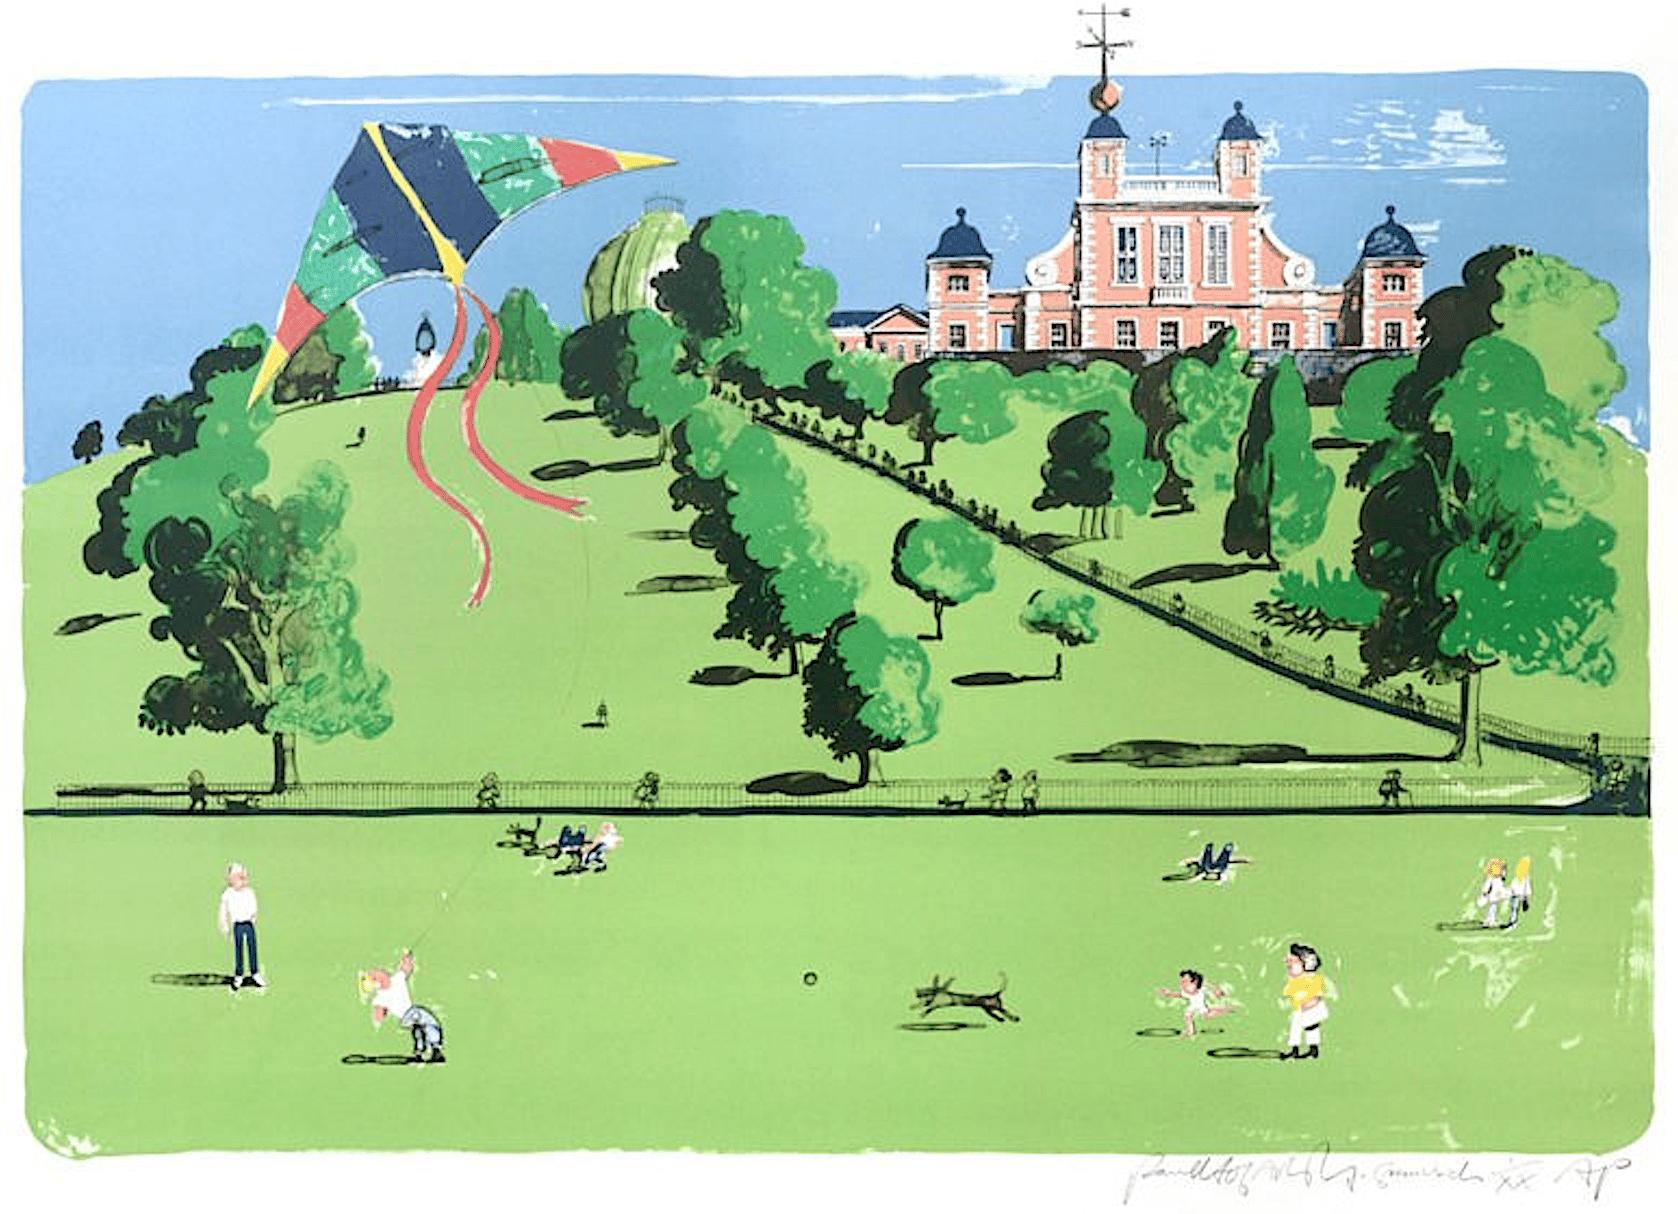 Kite Flying, Greenwich Park_Paul Hogarth